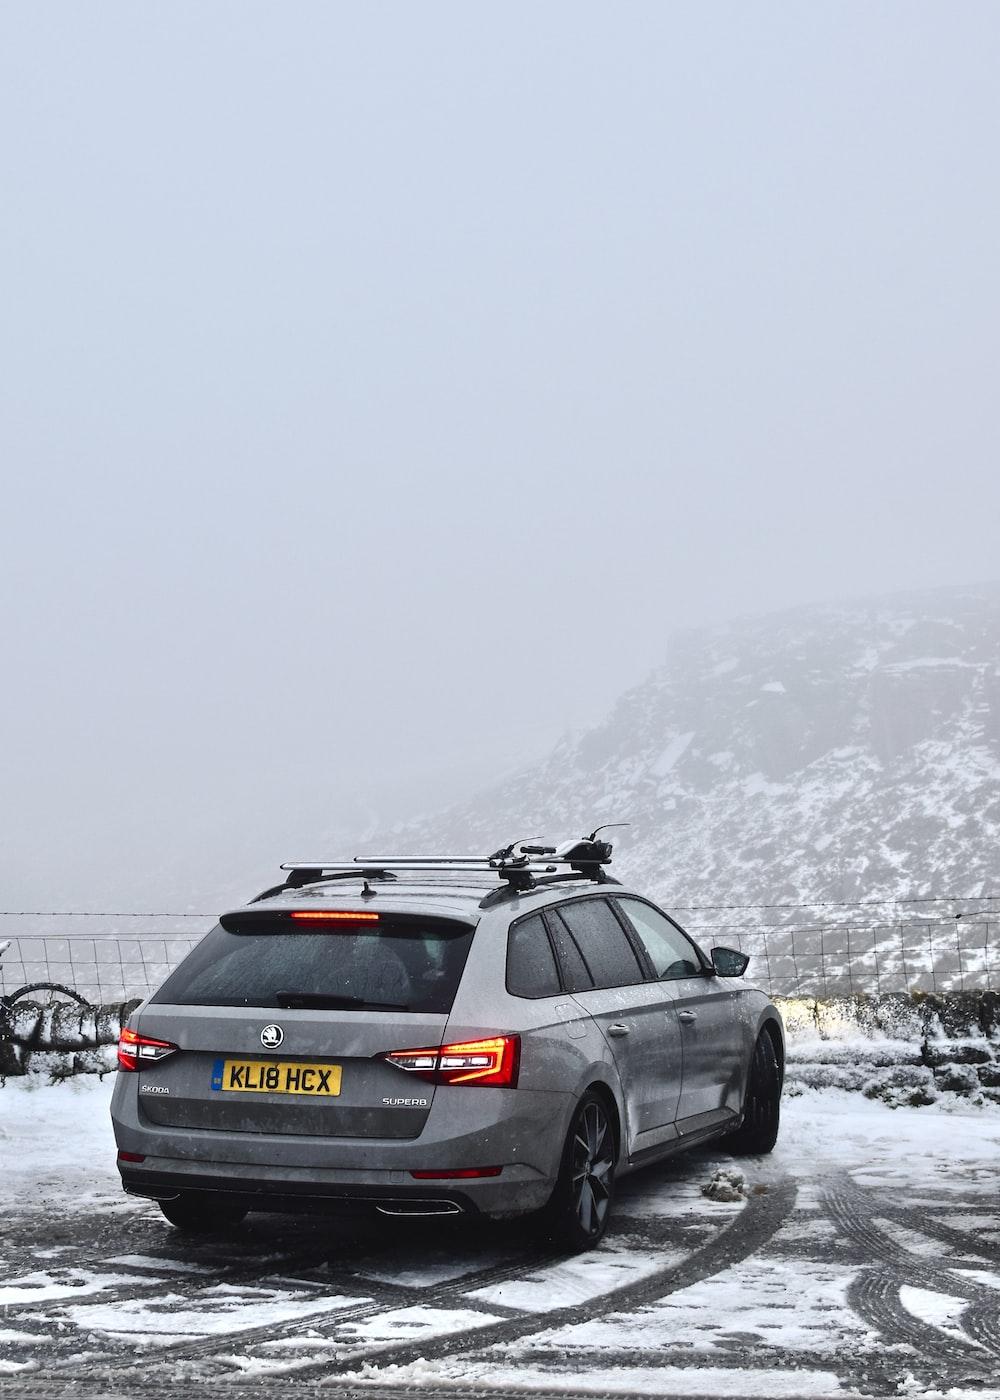 black honda car on snow covered ground during daytime